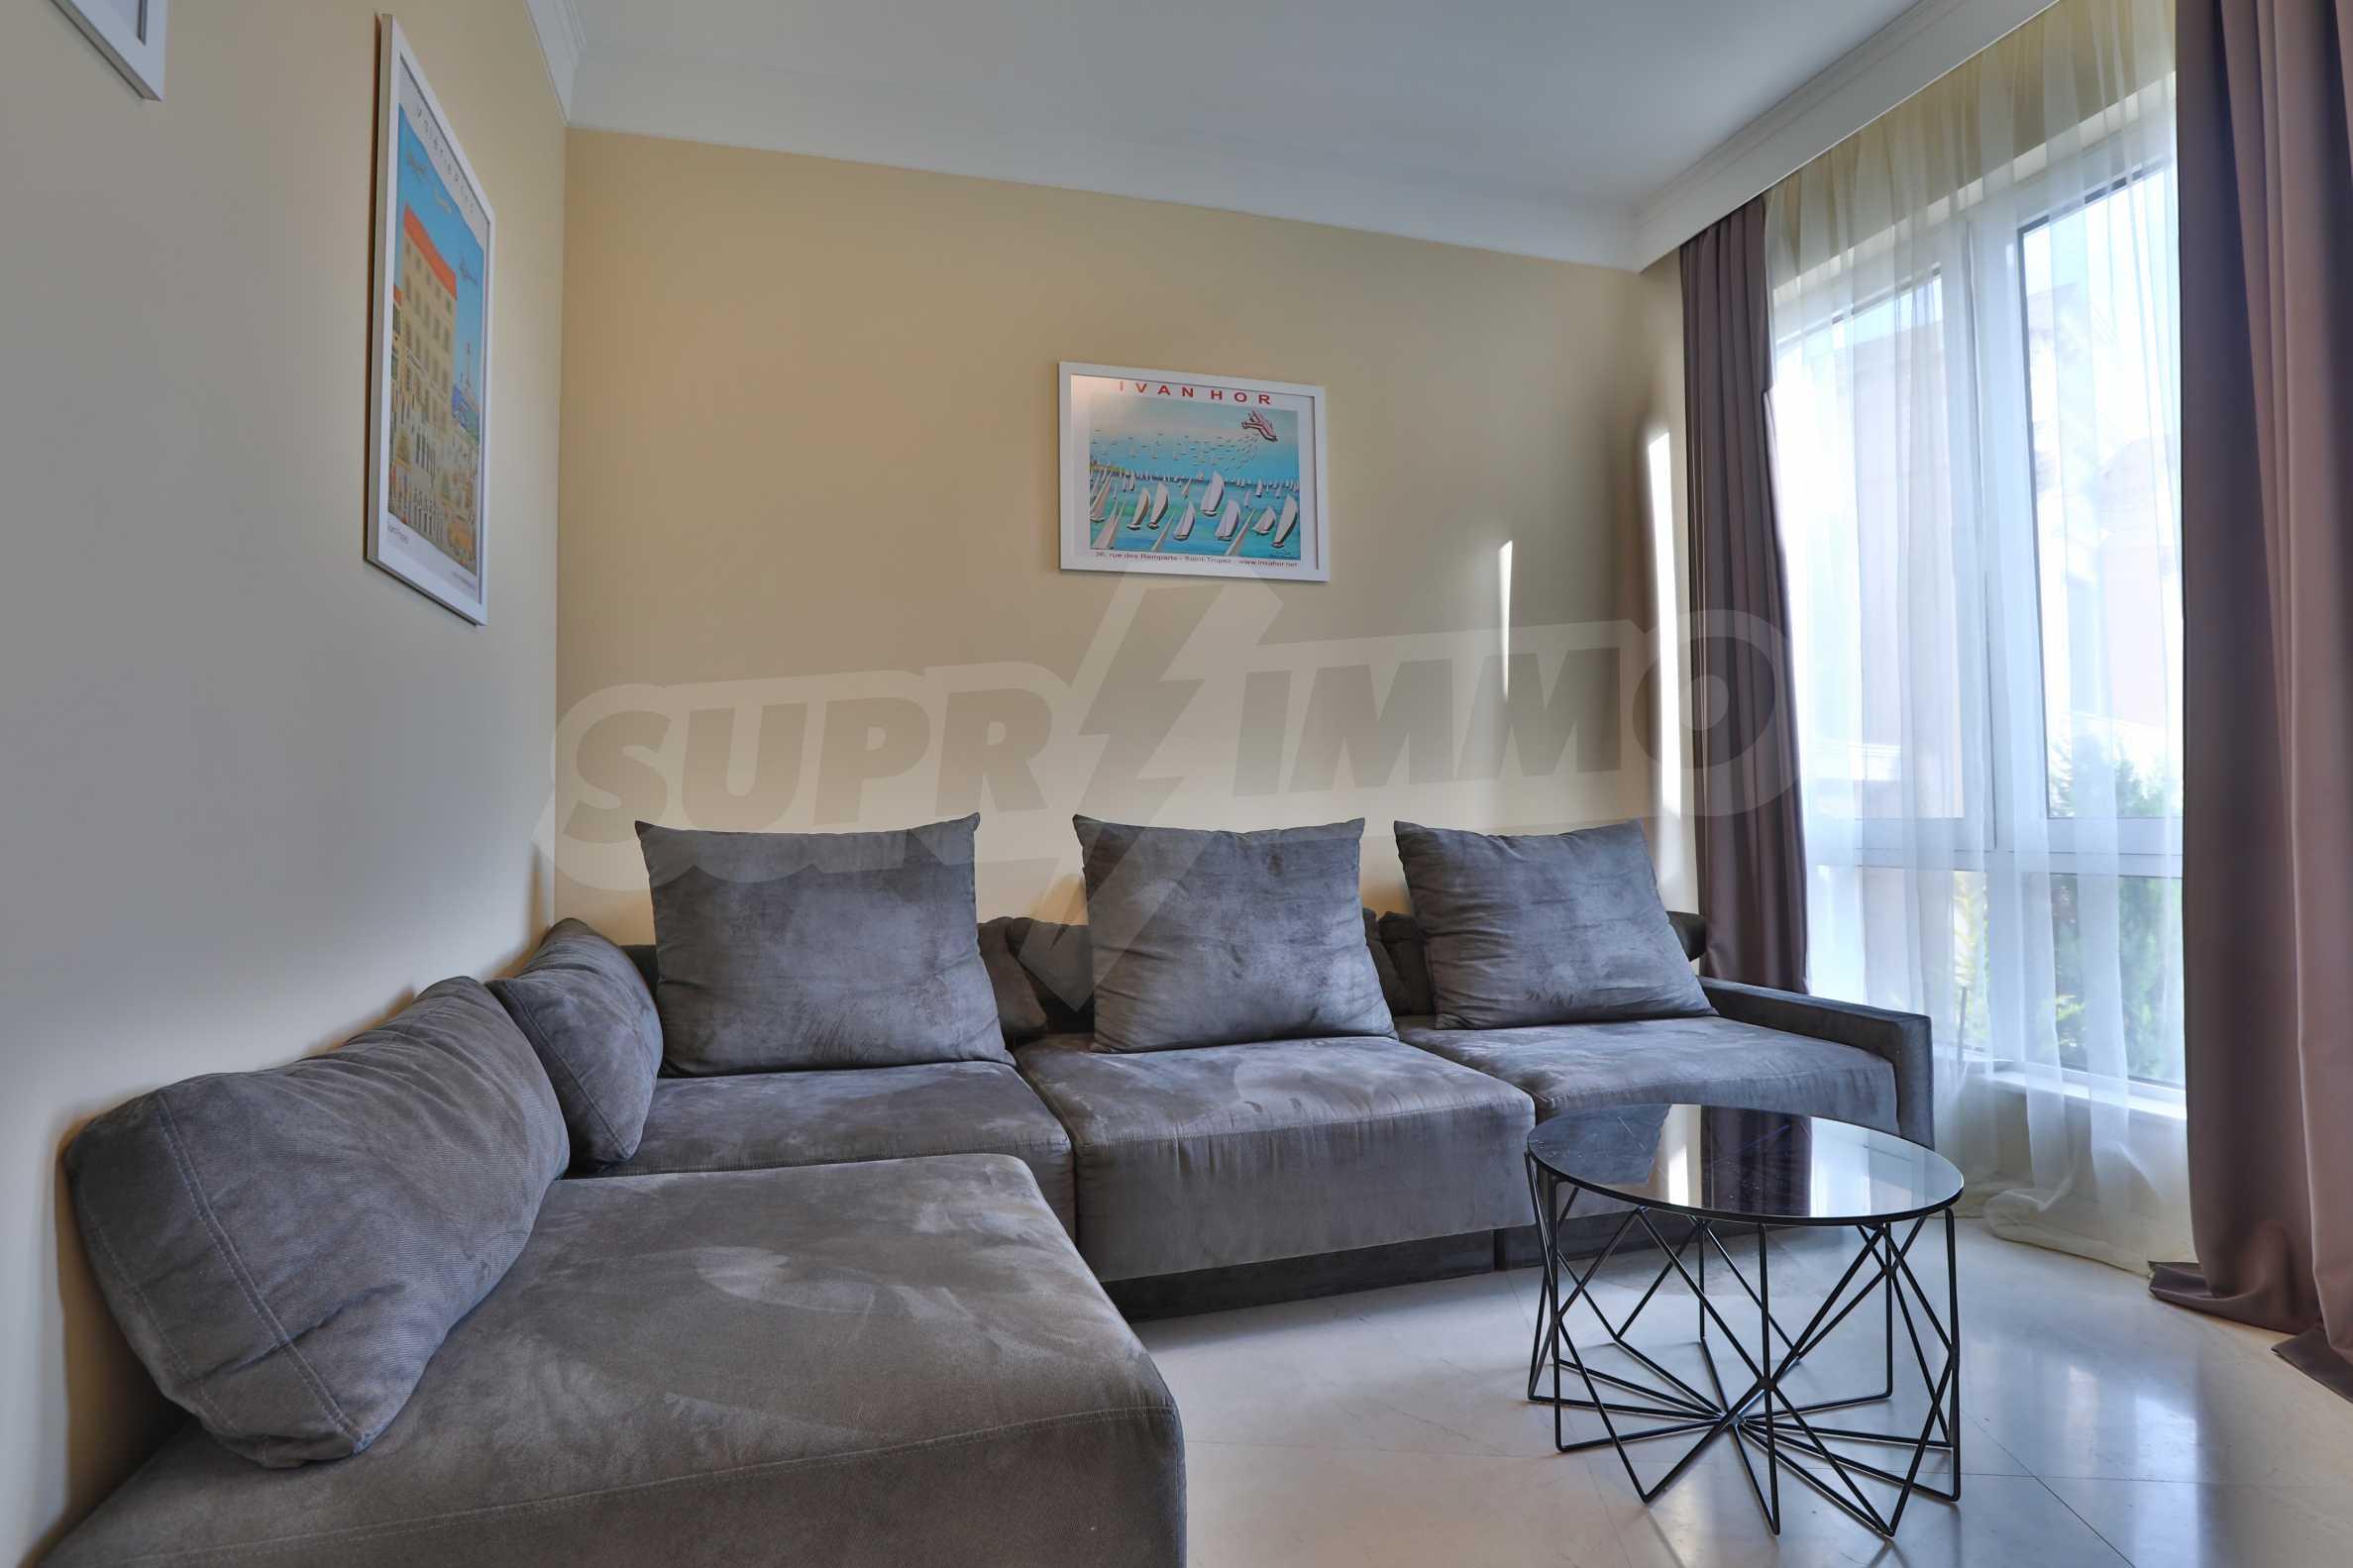 Exclusive 2-bedroom beachfront apartment in the prestigious Belle Époque Beach Residence 6